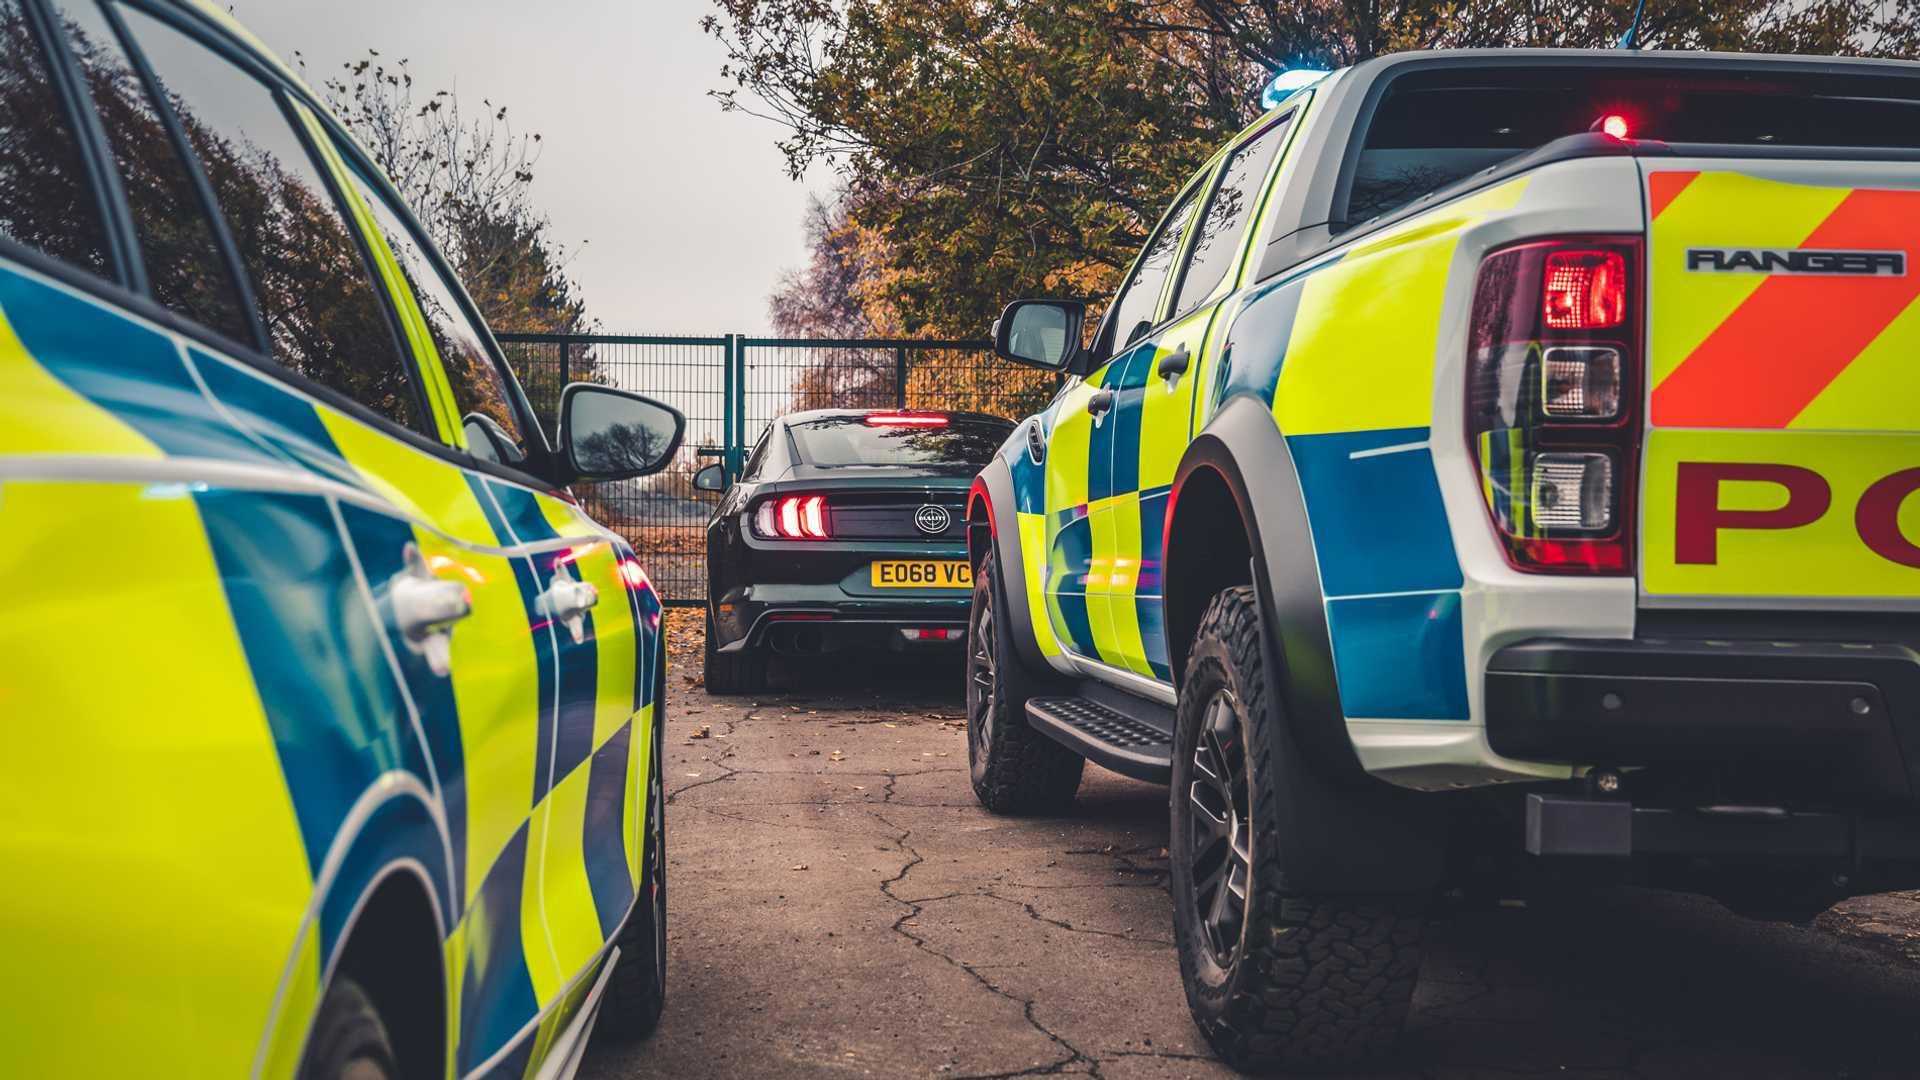 Ford-Focus-ST-and-Ranger-Raptor-UK-police-cars-3